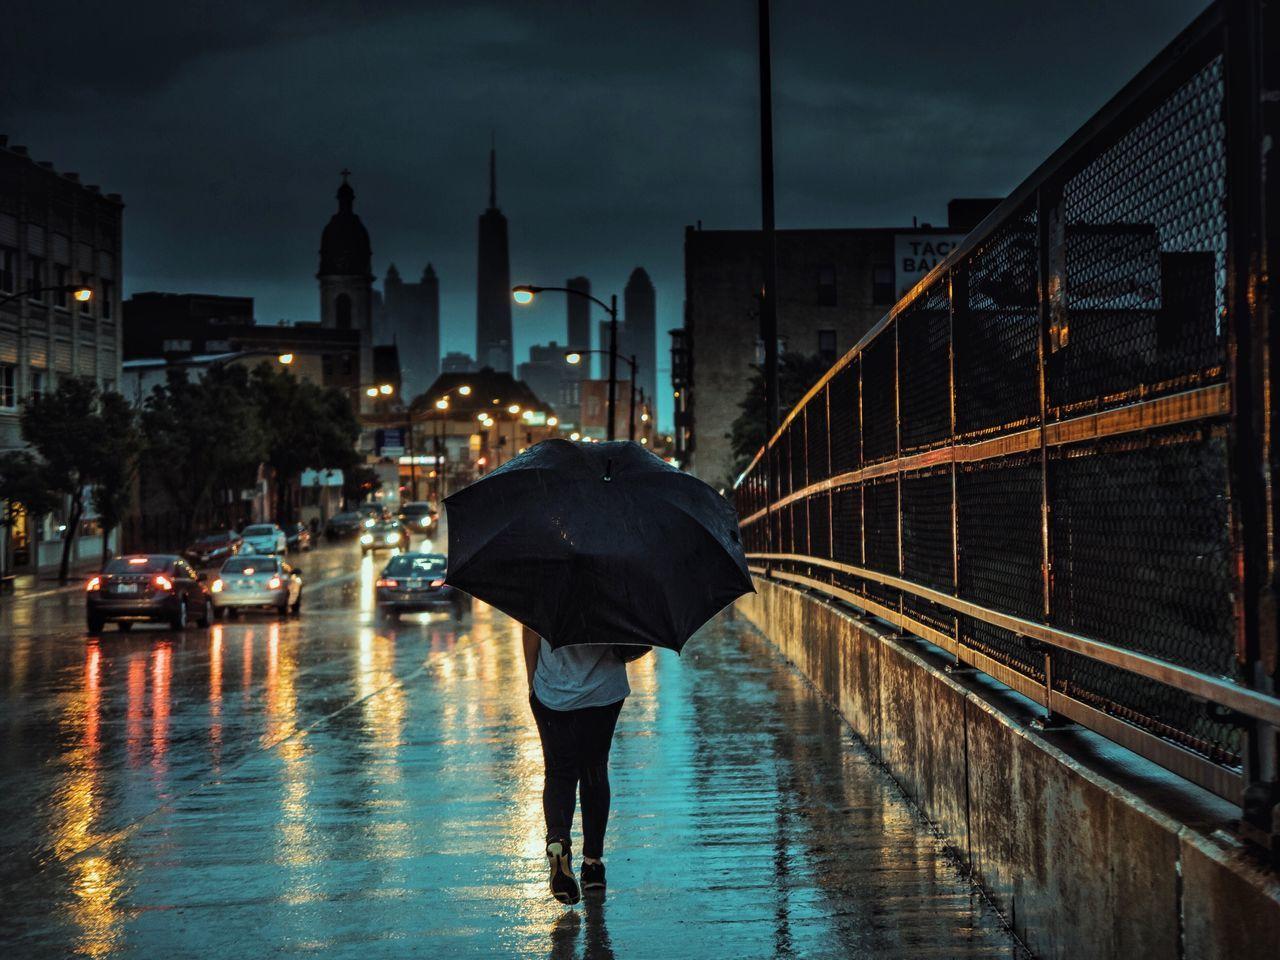 Chicago Architecture Moody Sky EyeEm Best Shots Moody Rain Umbrella VSCO